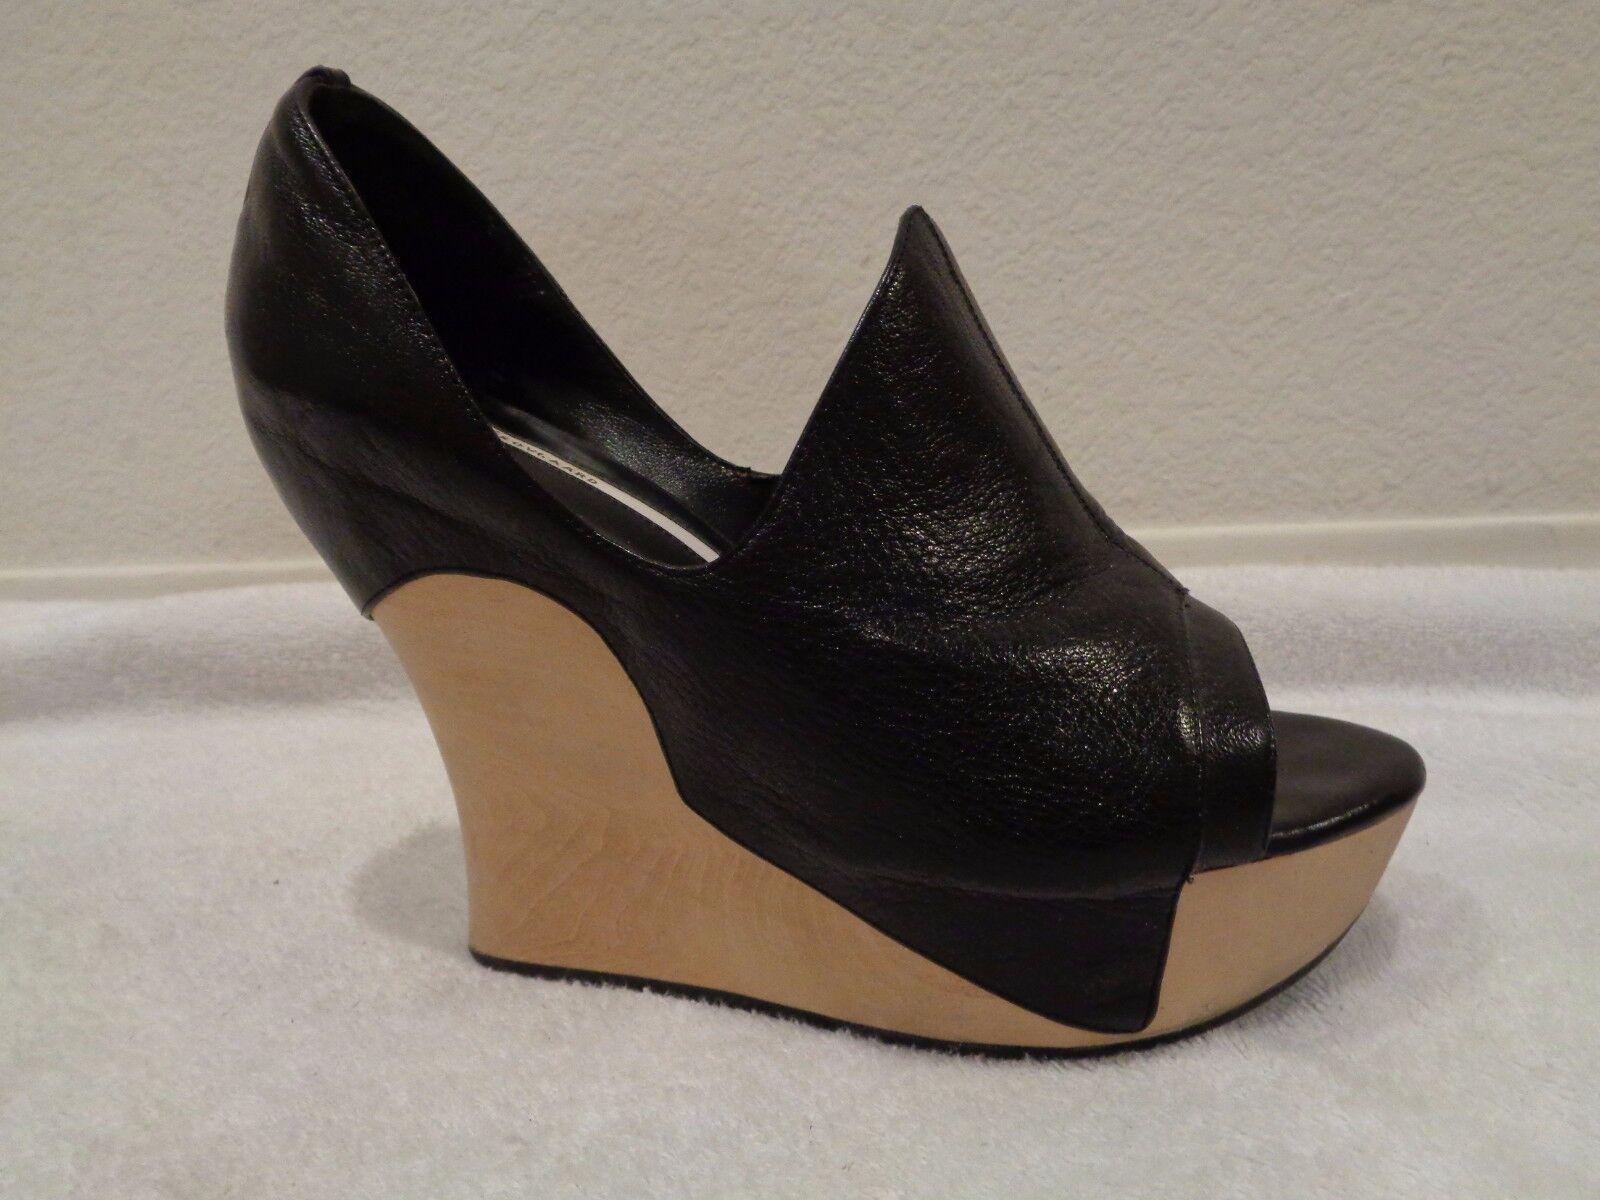 alla moda Camilla Skovgaard nero Tanganica Tanganica Tanganica Textured Leather Wooden Wedges SZ 40 9 US  risparmiare sulla liquidazione